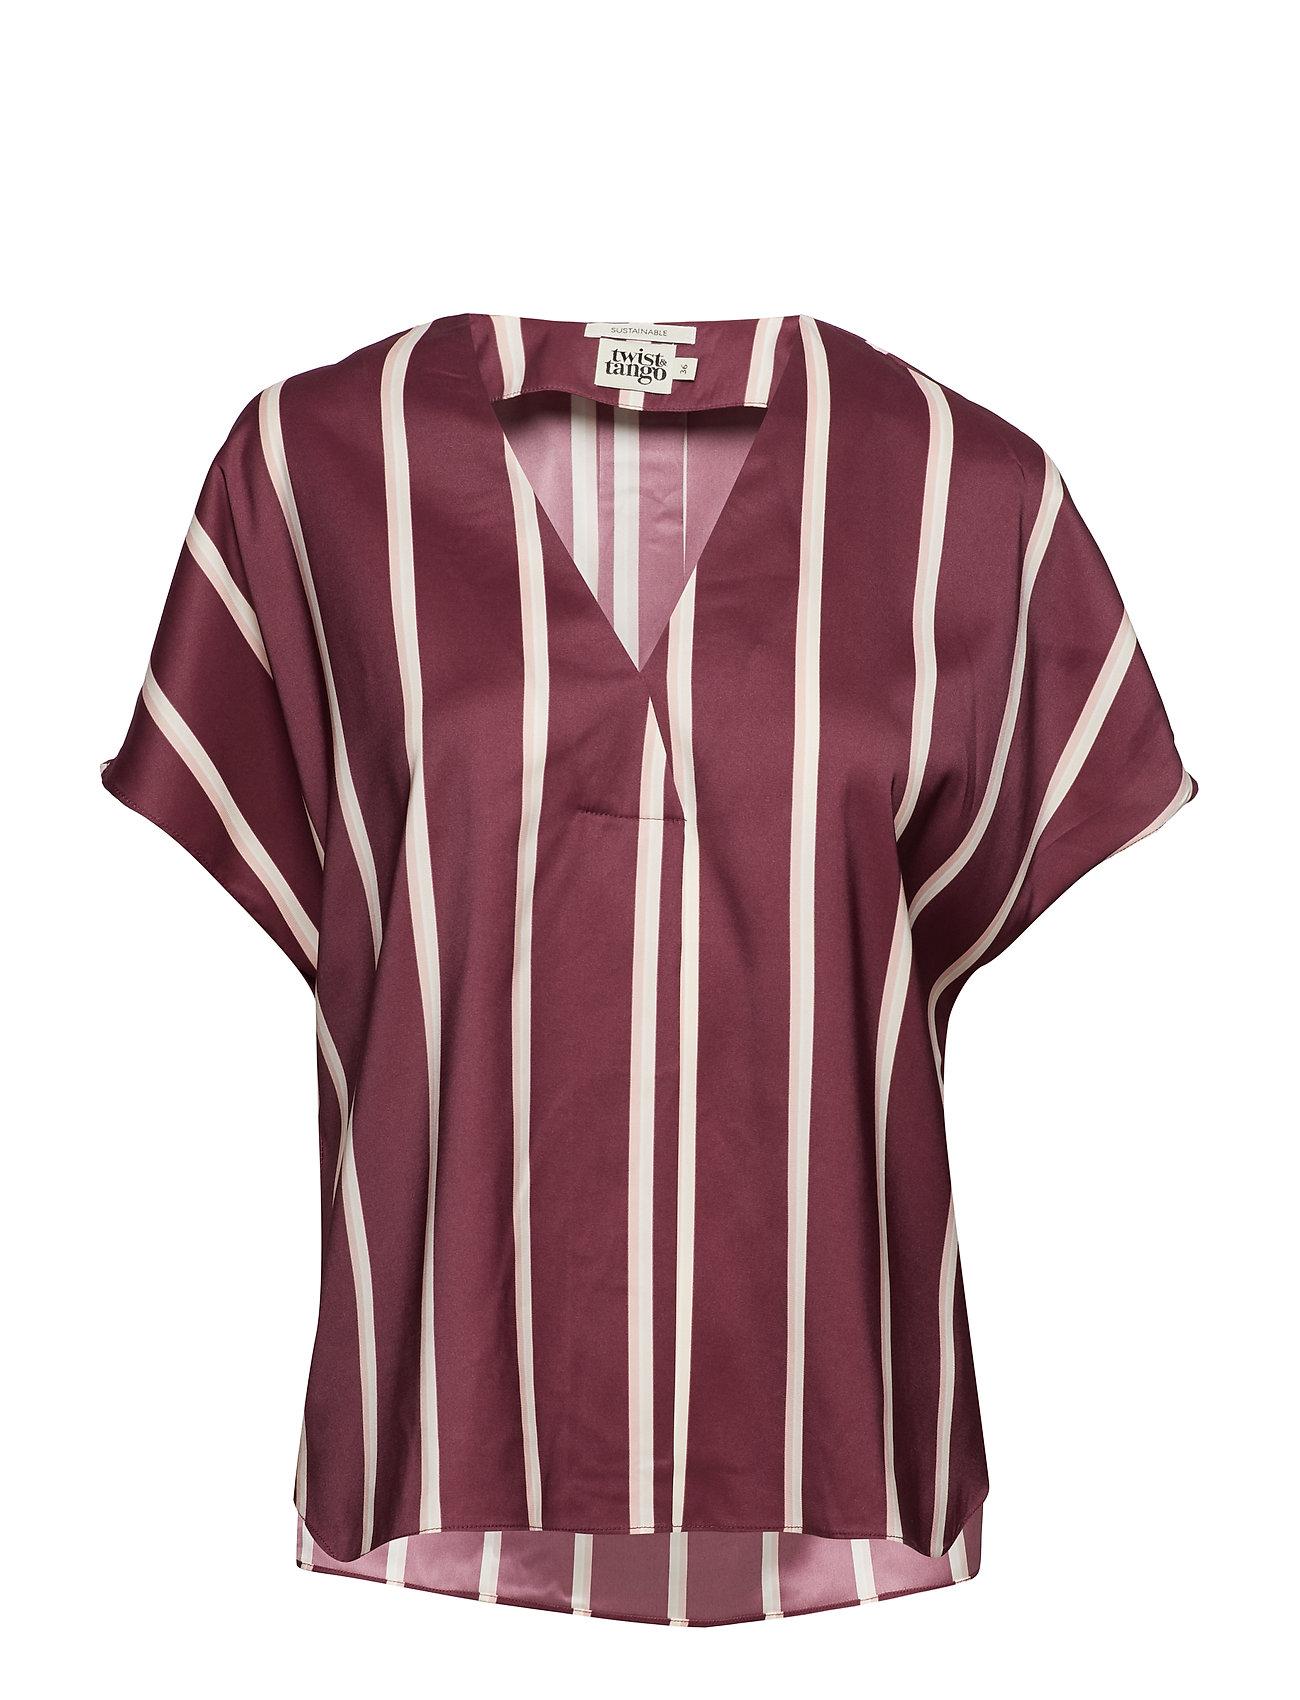 e5466146 Tatiana Blouse Burgundy (Burgundy Stripe) (649.35 kr) - Twist ...